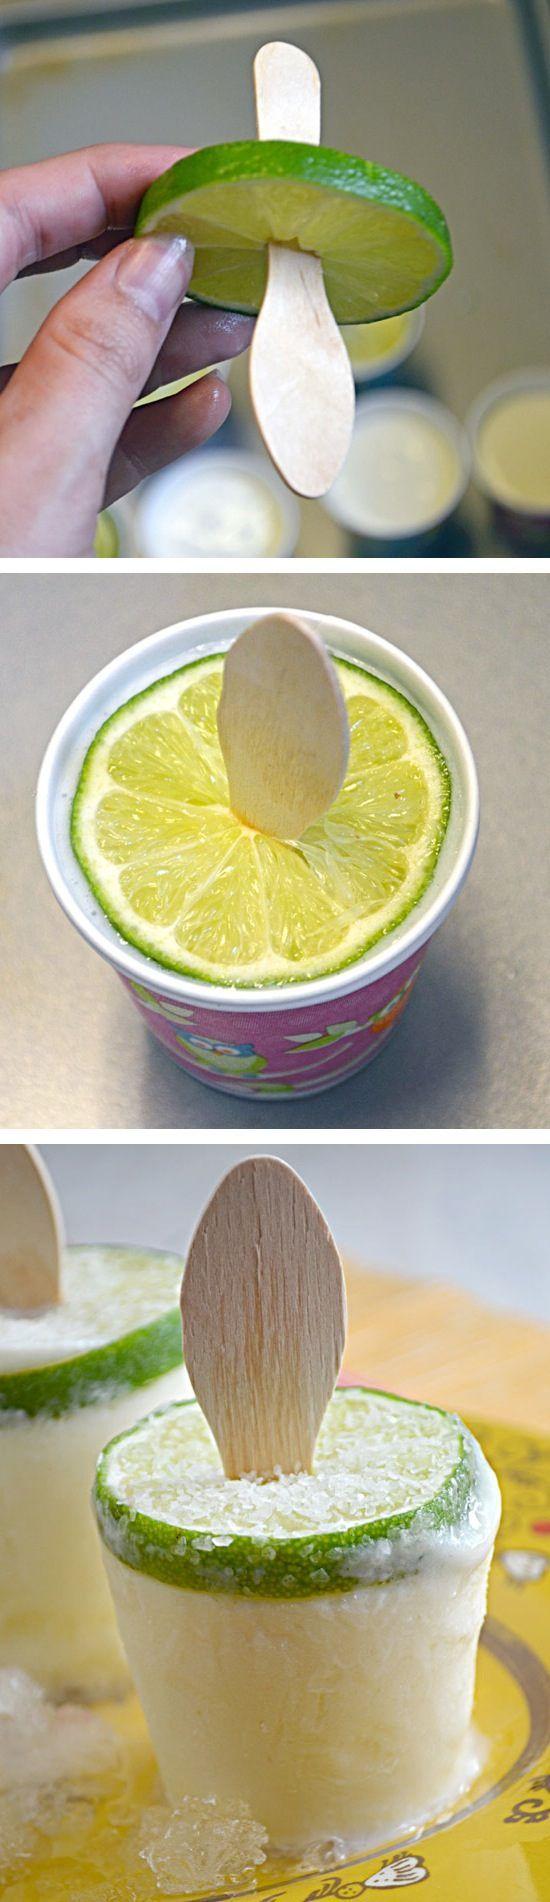 Creamy Margarita Popsicles   Recipe By Photo